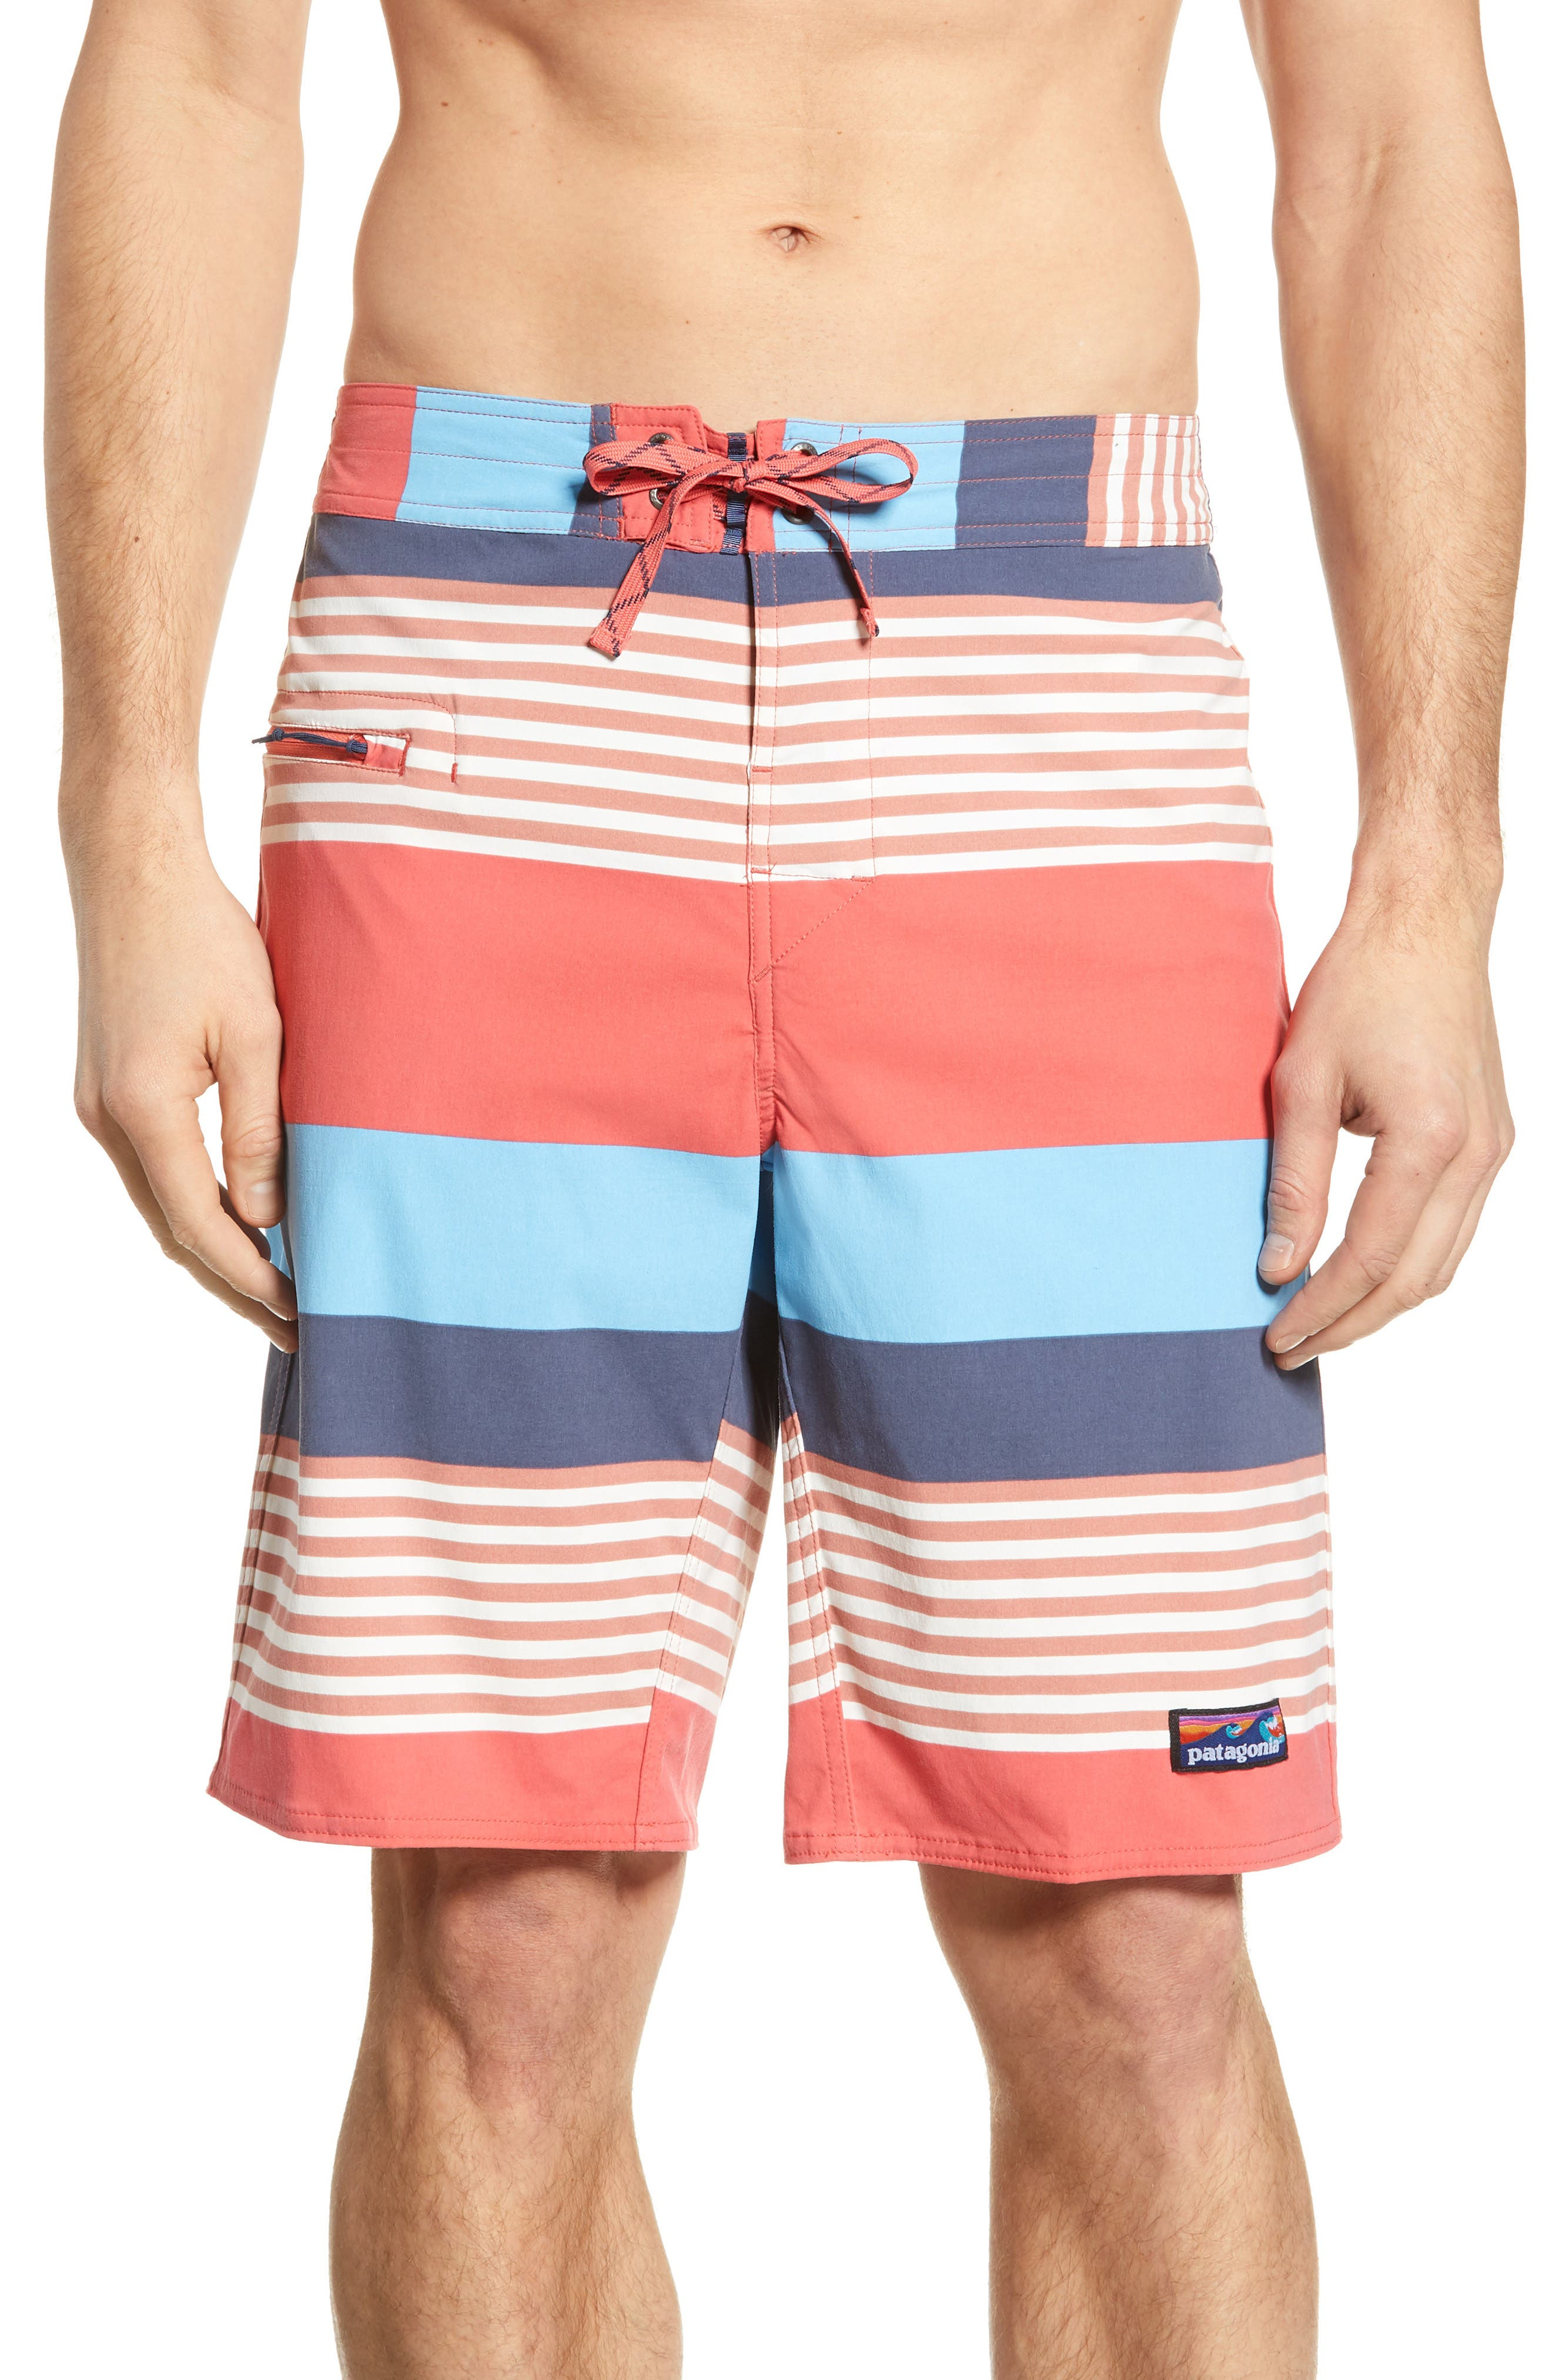 PATAGONIA Wavefarer Board Shorts, Main, color, FITZ STRIPE: SPICED CORAL